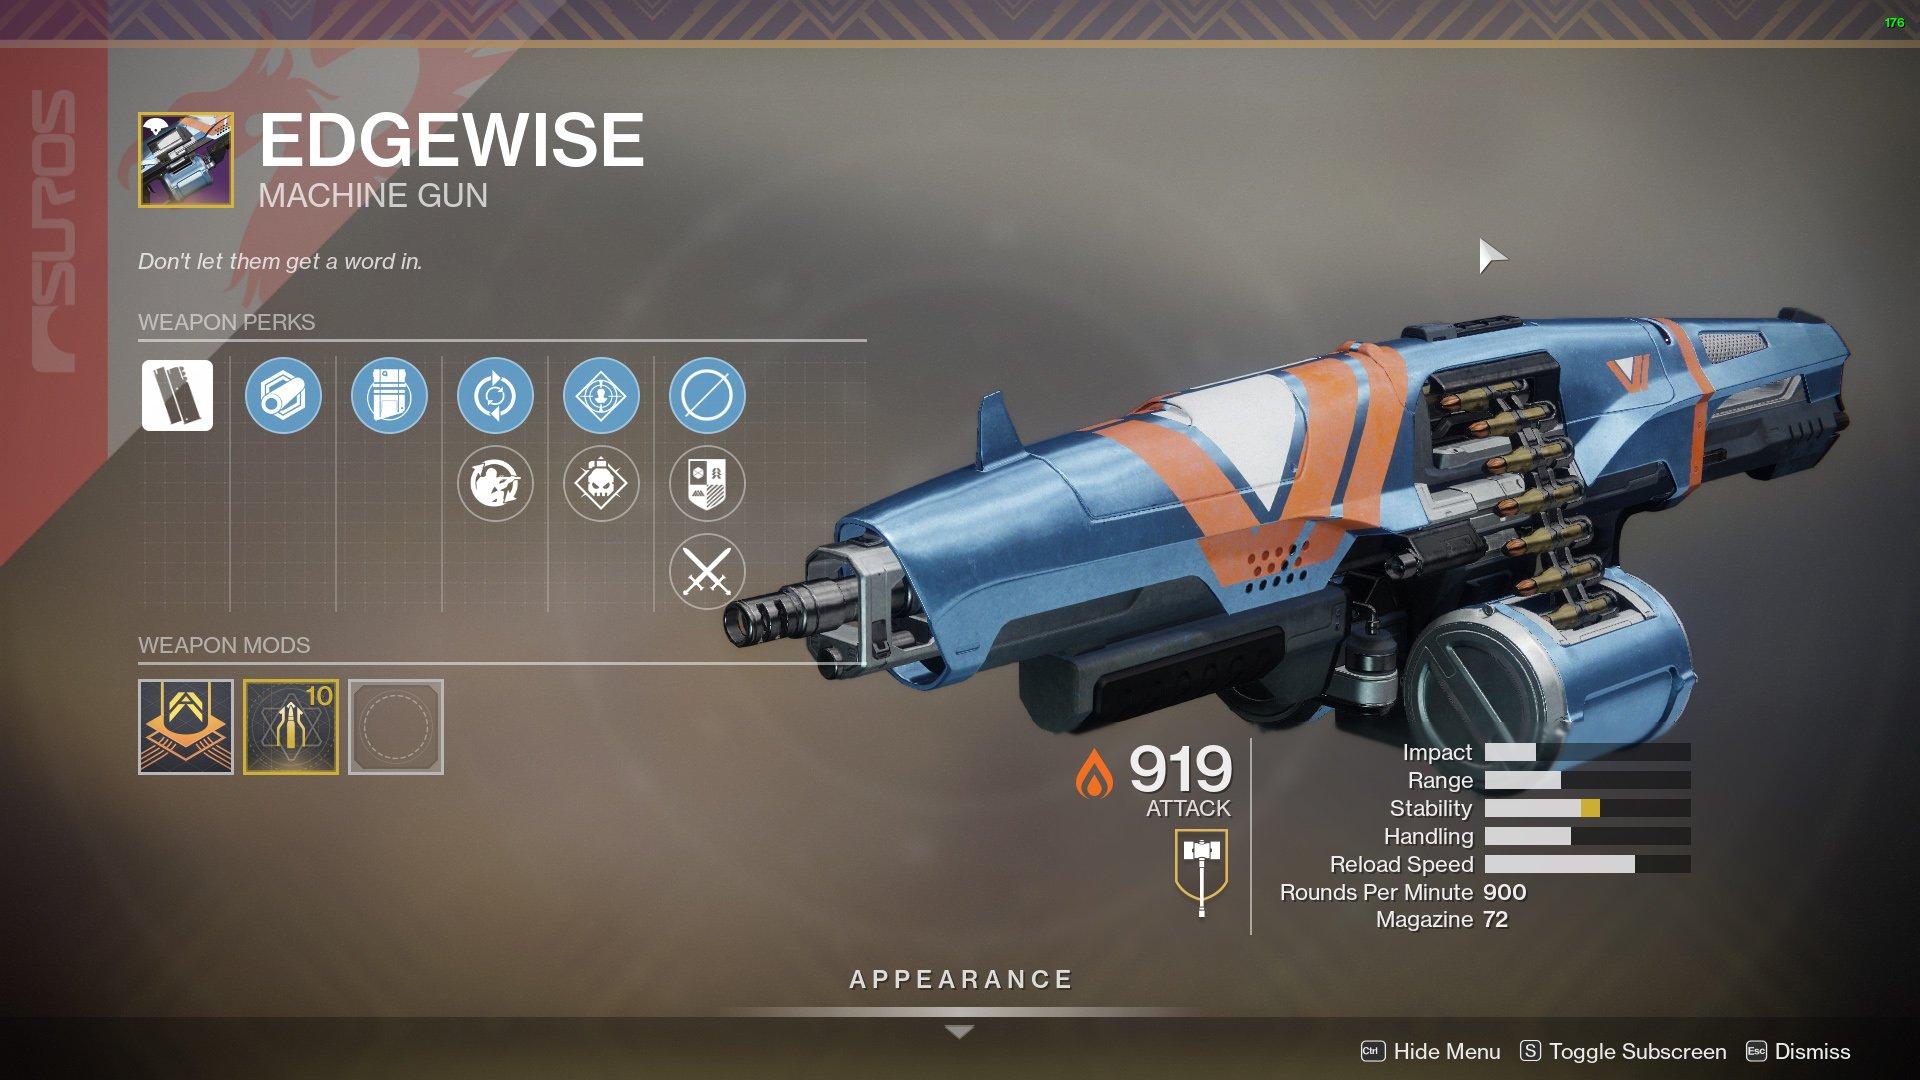 Destiny 2 Edgewise perks